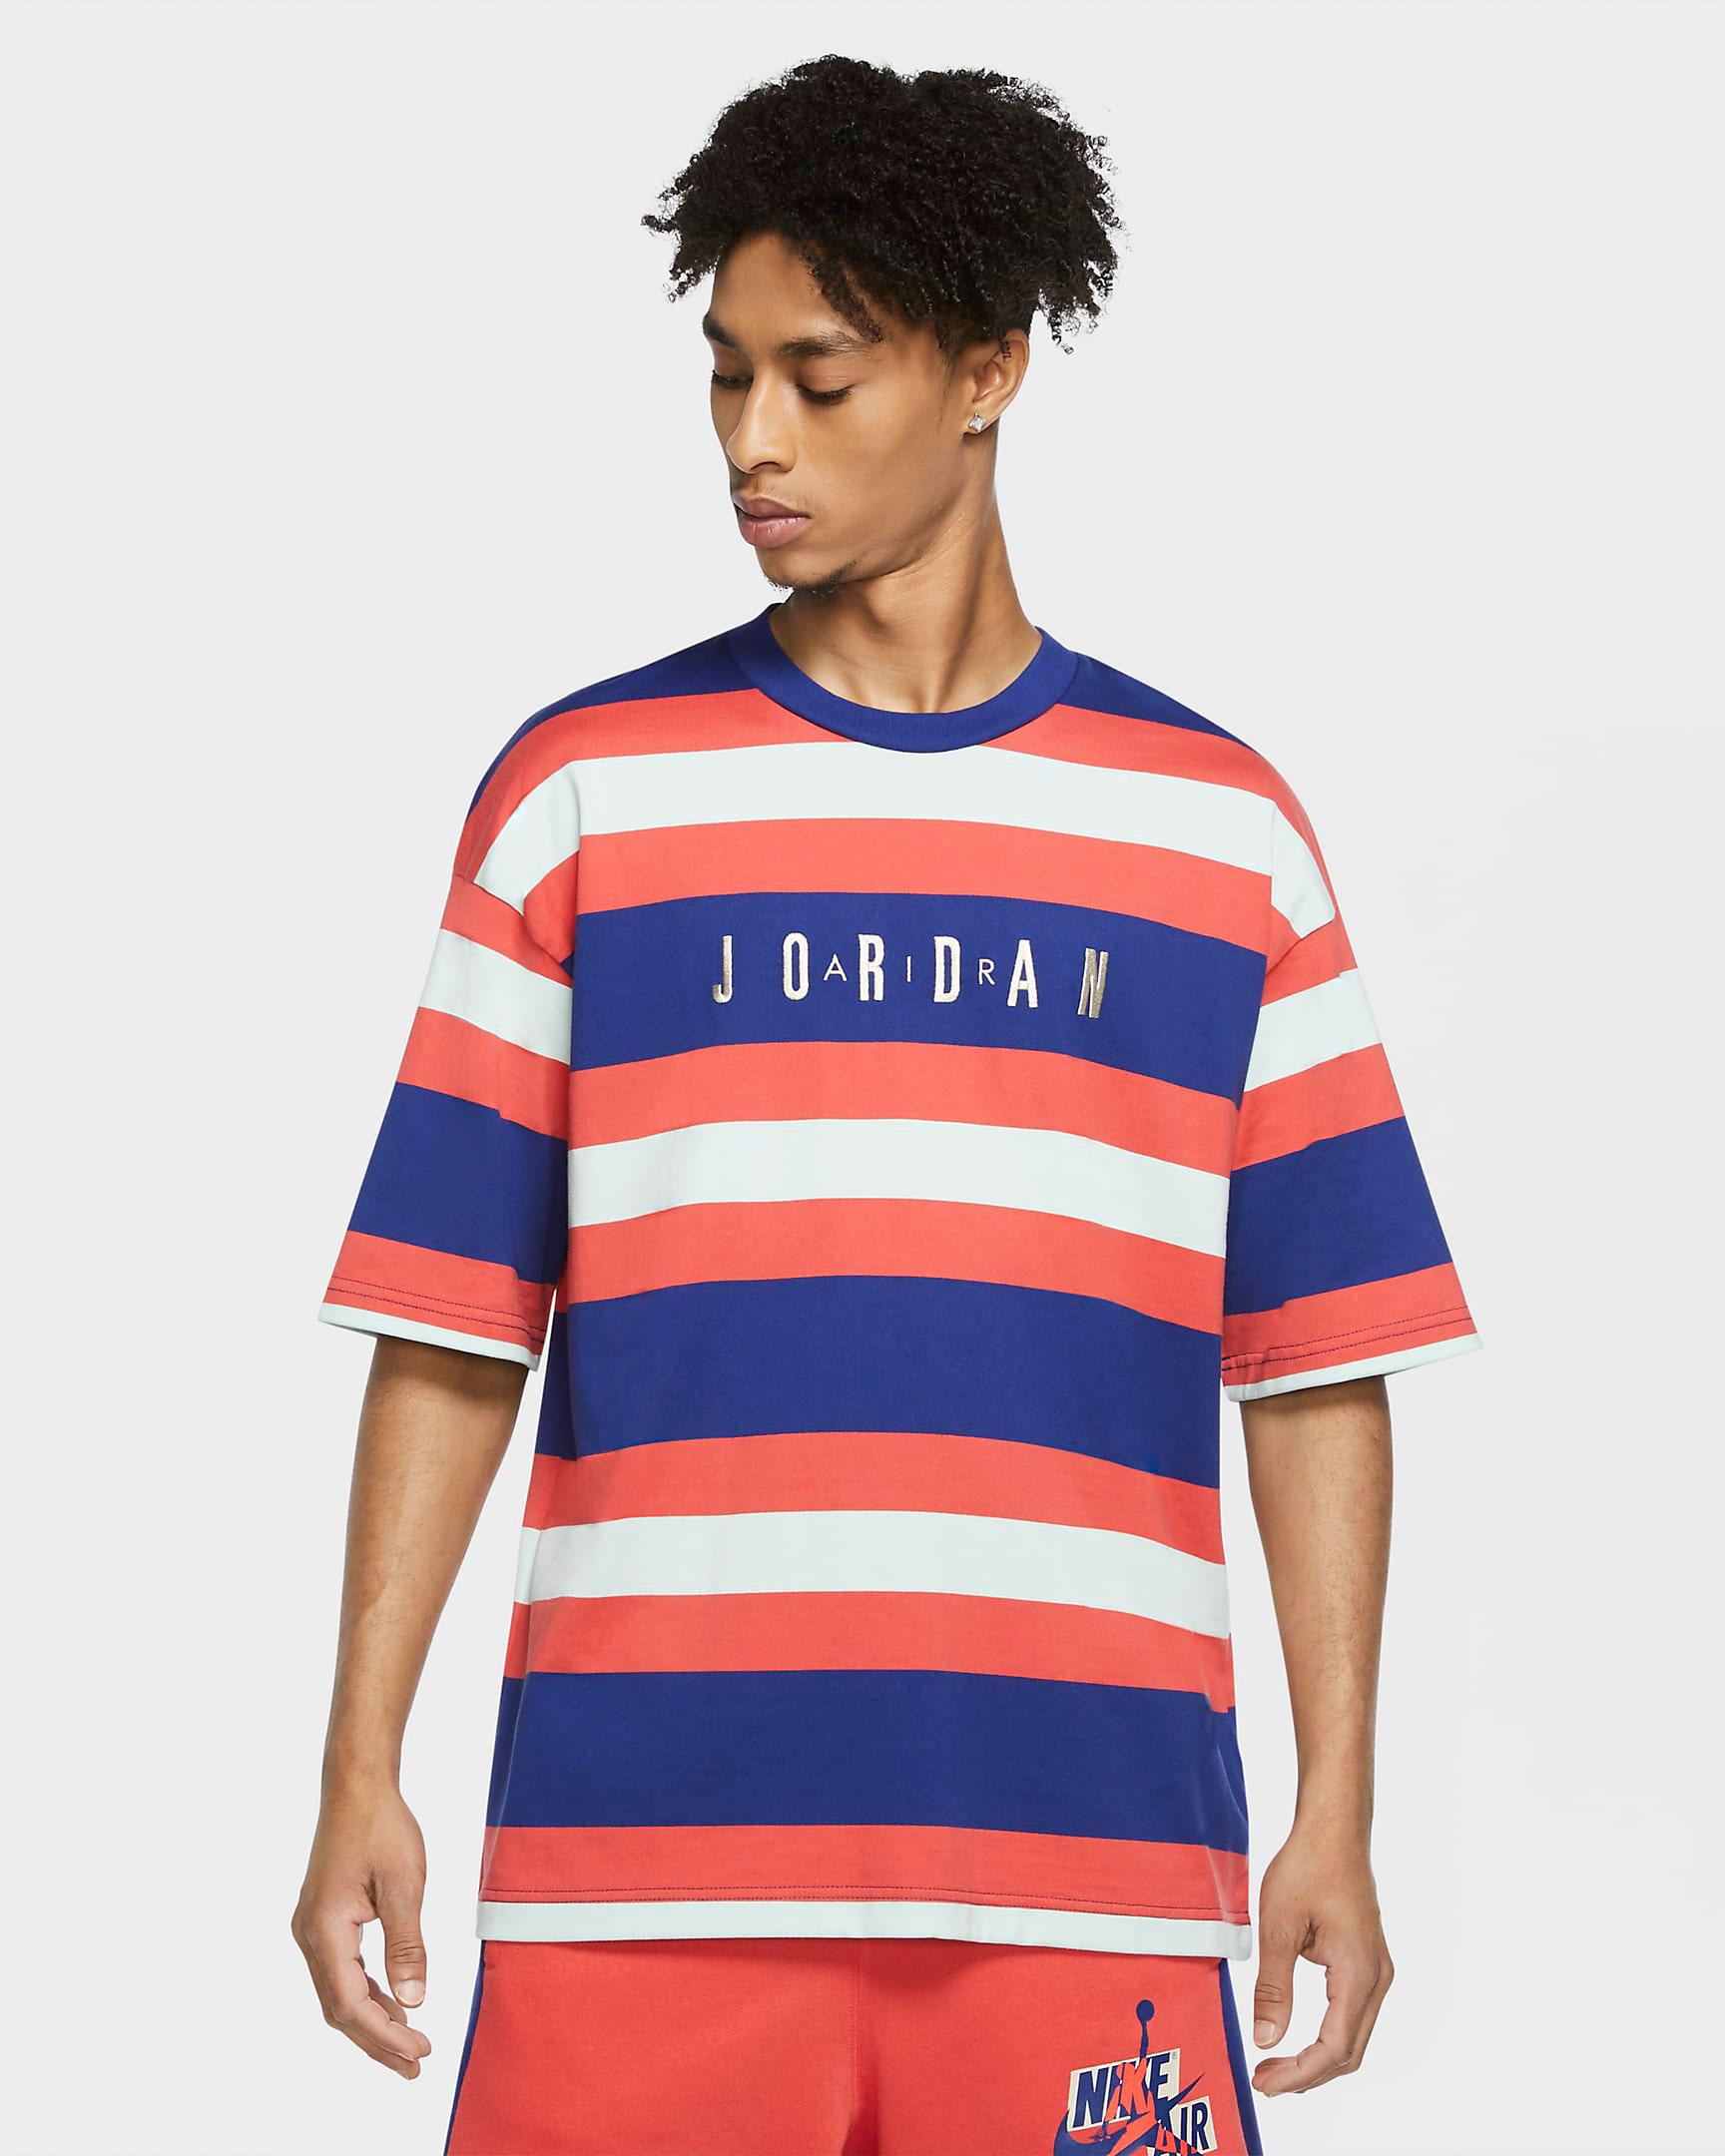 jordan-sport-dna-stripe-shirt-blue-infrared